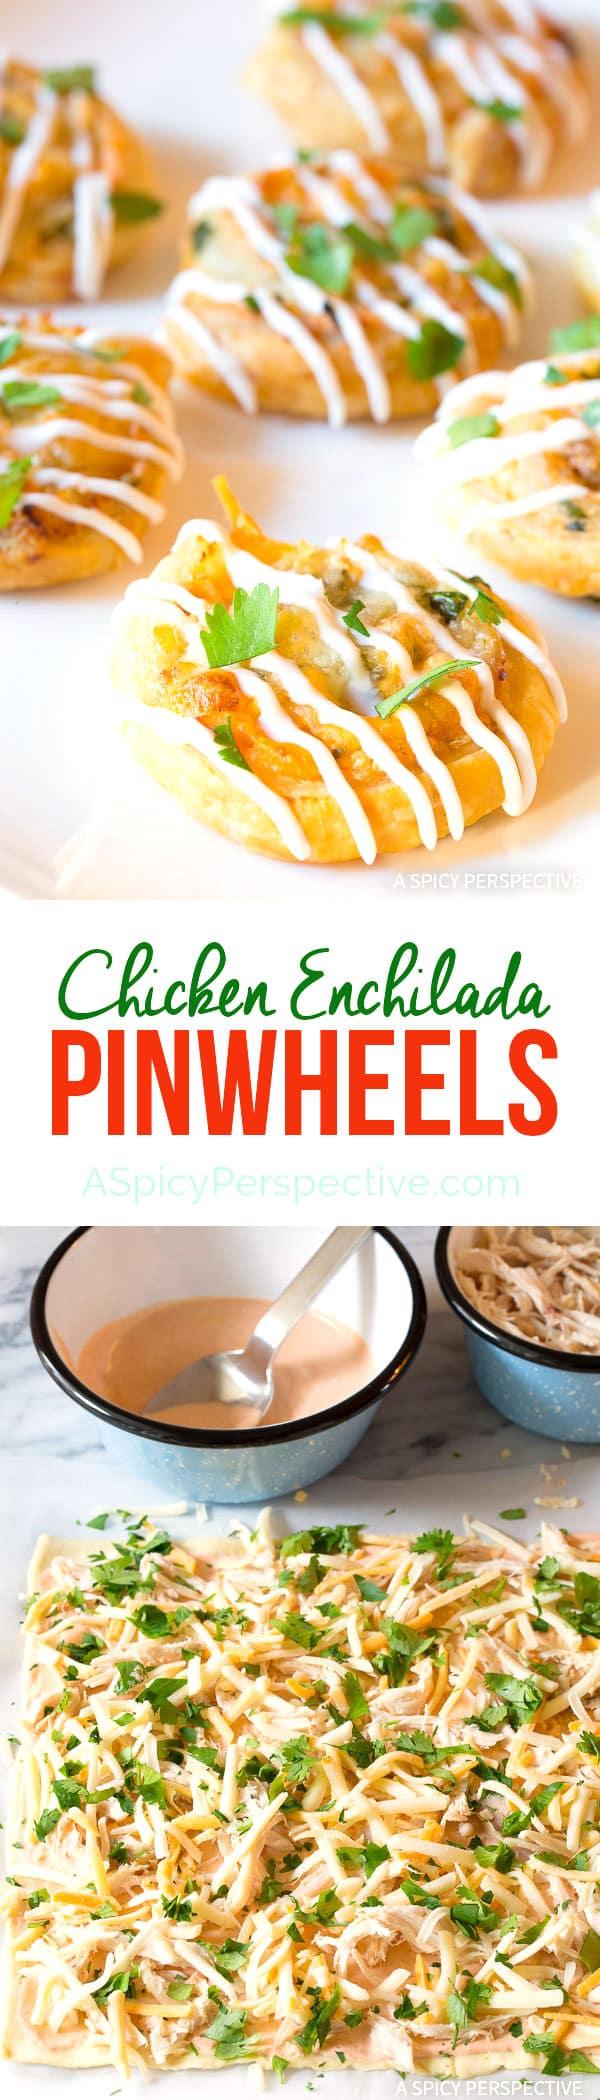 Great for Super Bowl! 7-Ingredient Chicken Enchilada Pinwheel Recipe | ASpicyPerspective.com